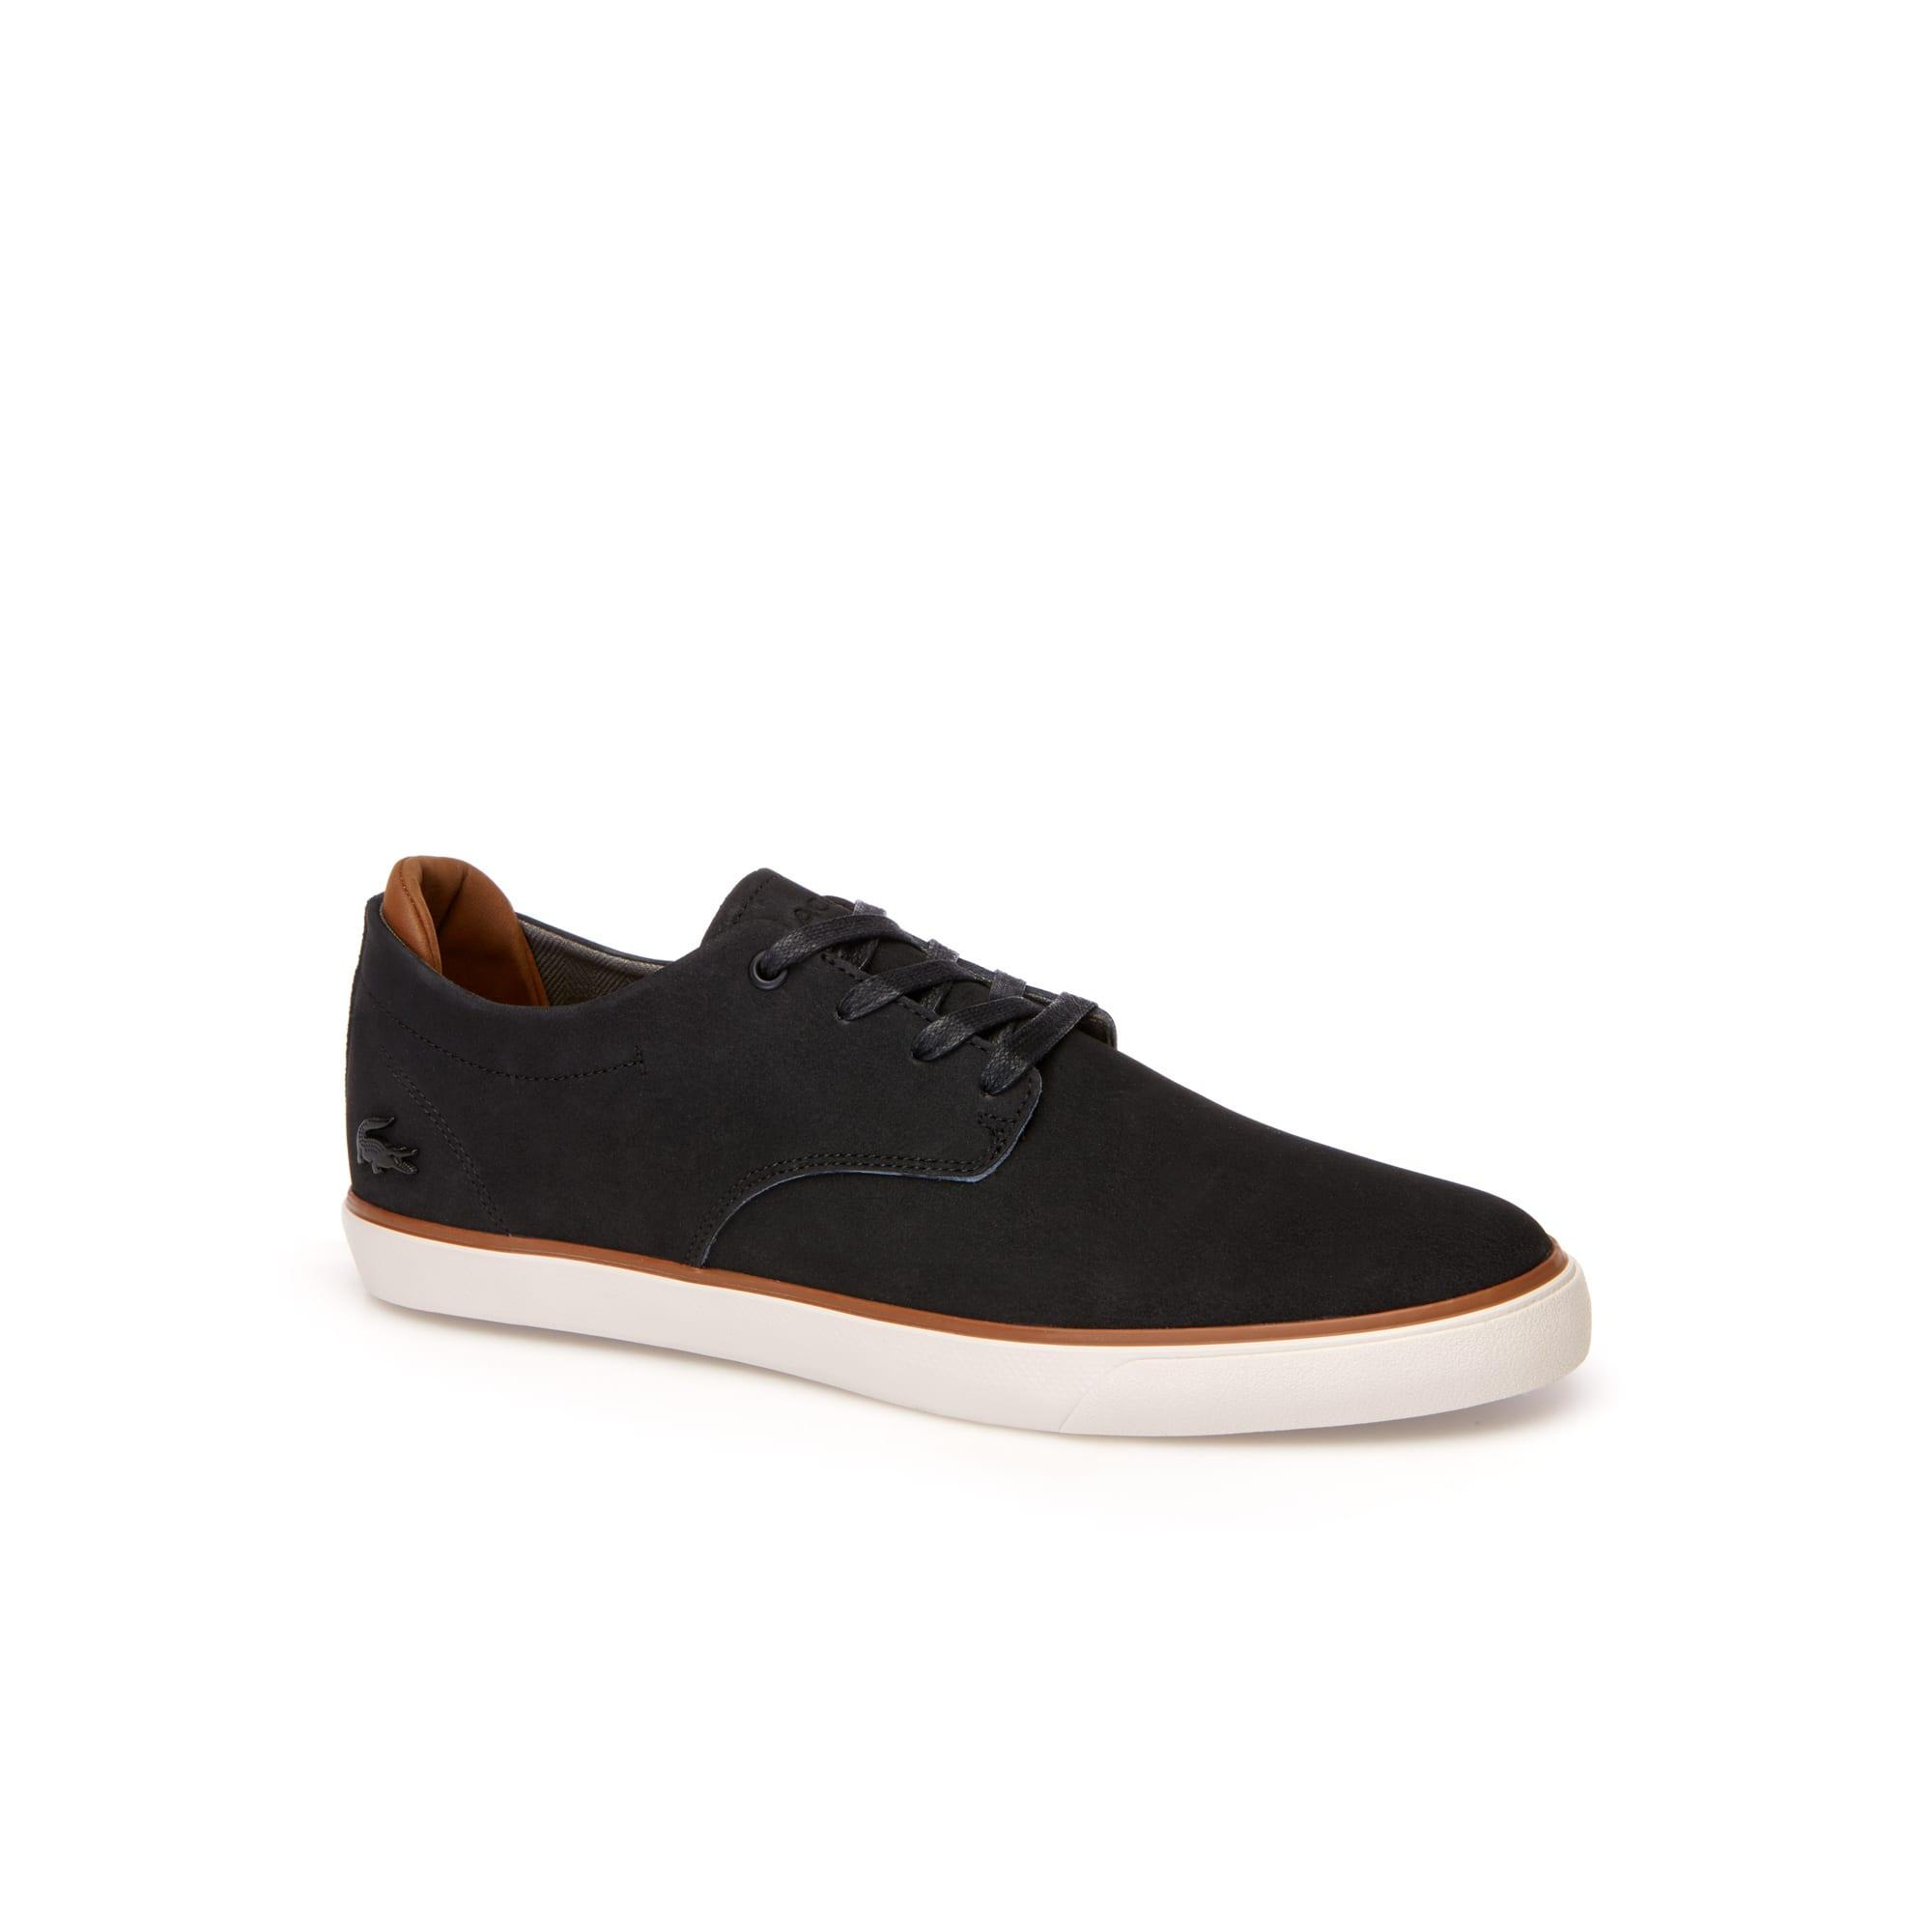 Herren-Sneakers ESPARRE aus Leder und Veloursleder